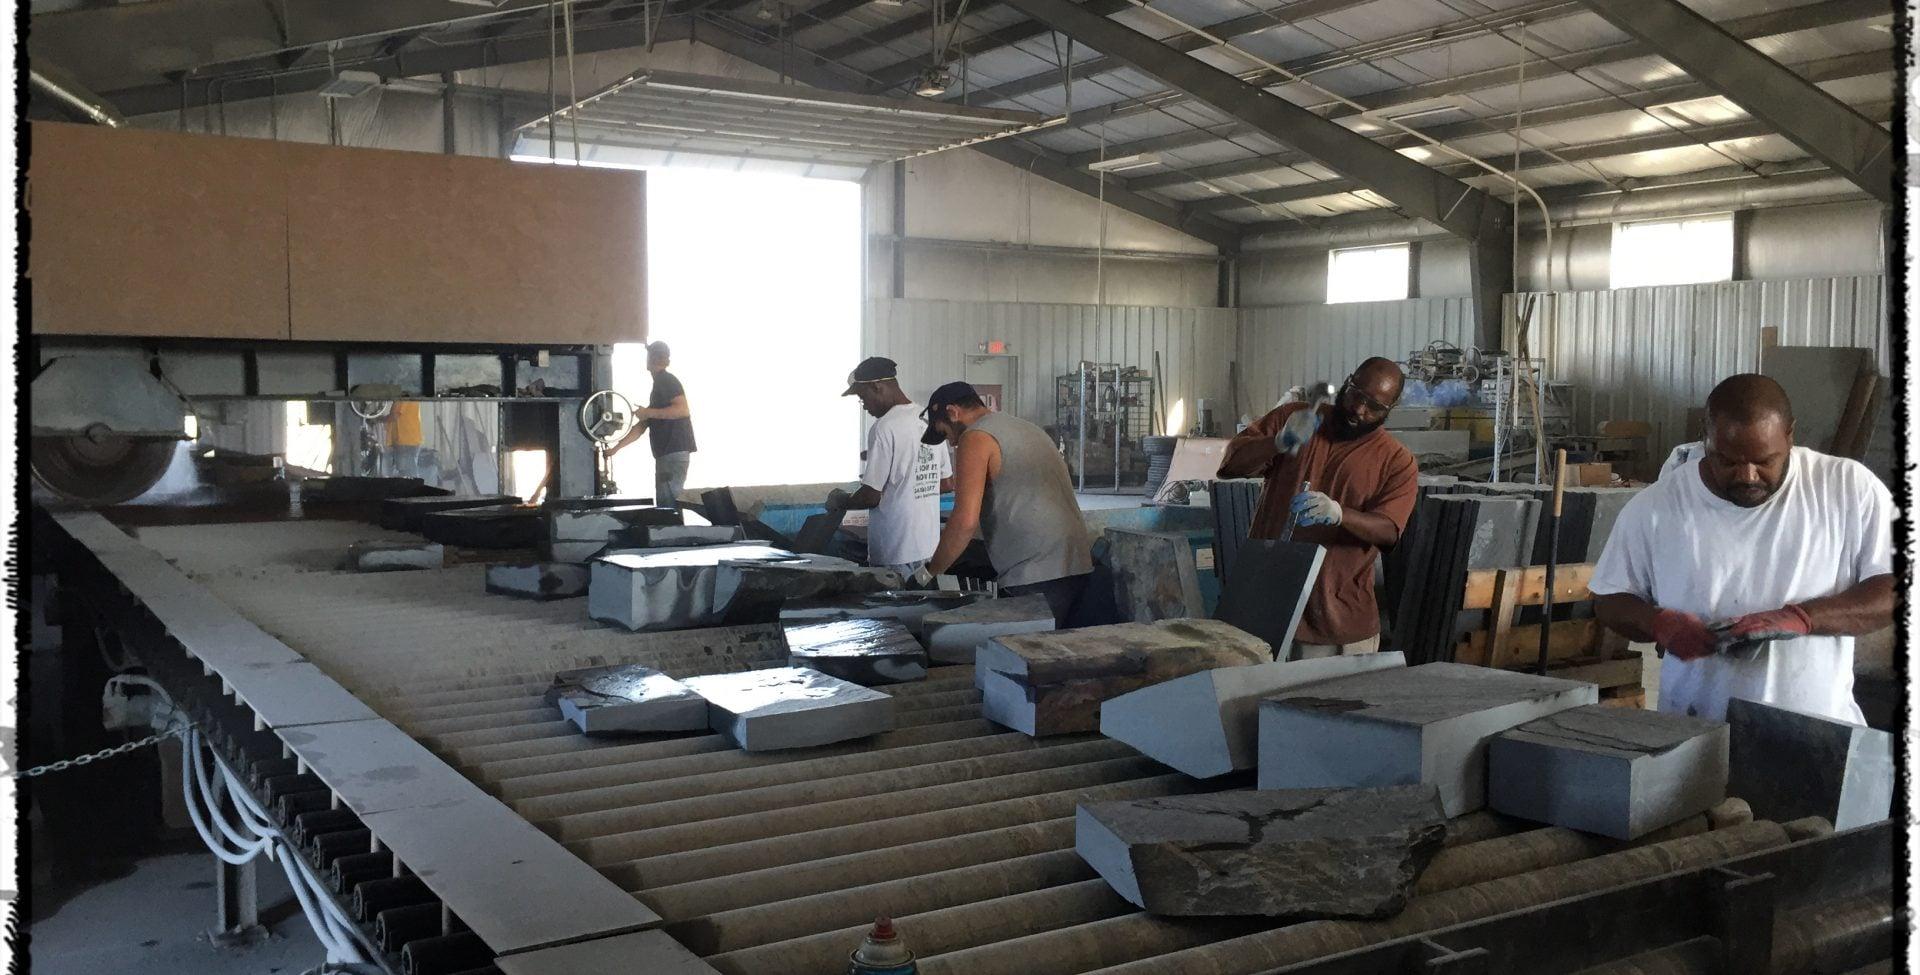 Our slate production facility in Buckingham County Virginia